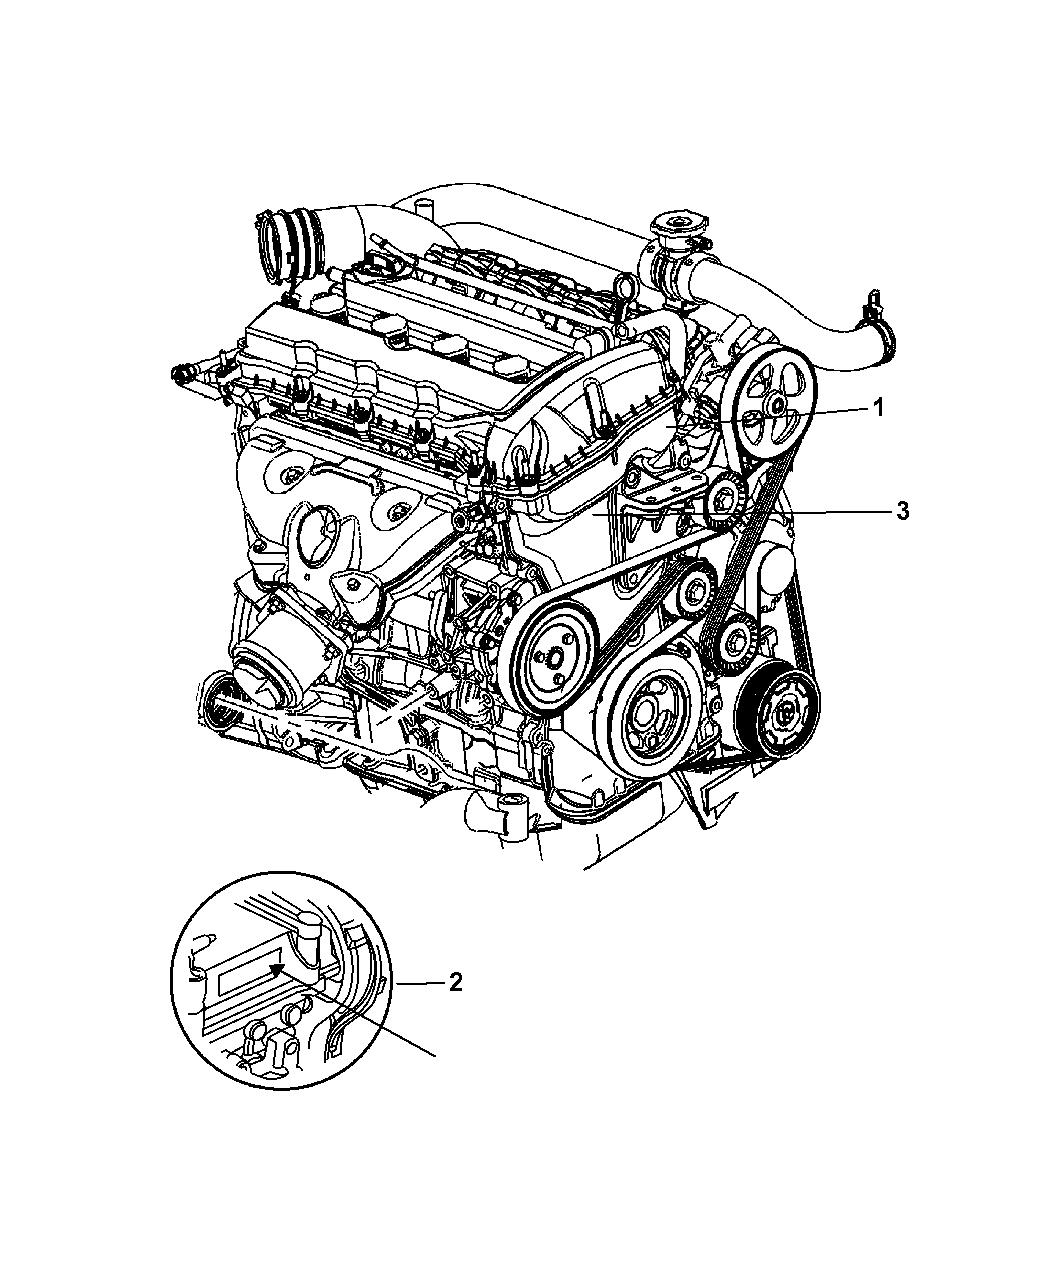 mopar 5047877ac chrysler 2.7 engine diagram 2010 chrysler engine diagram #7